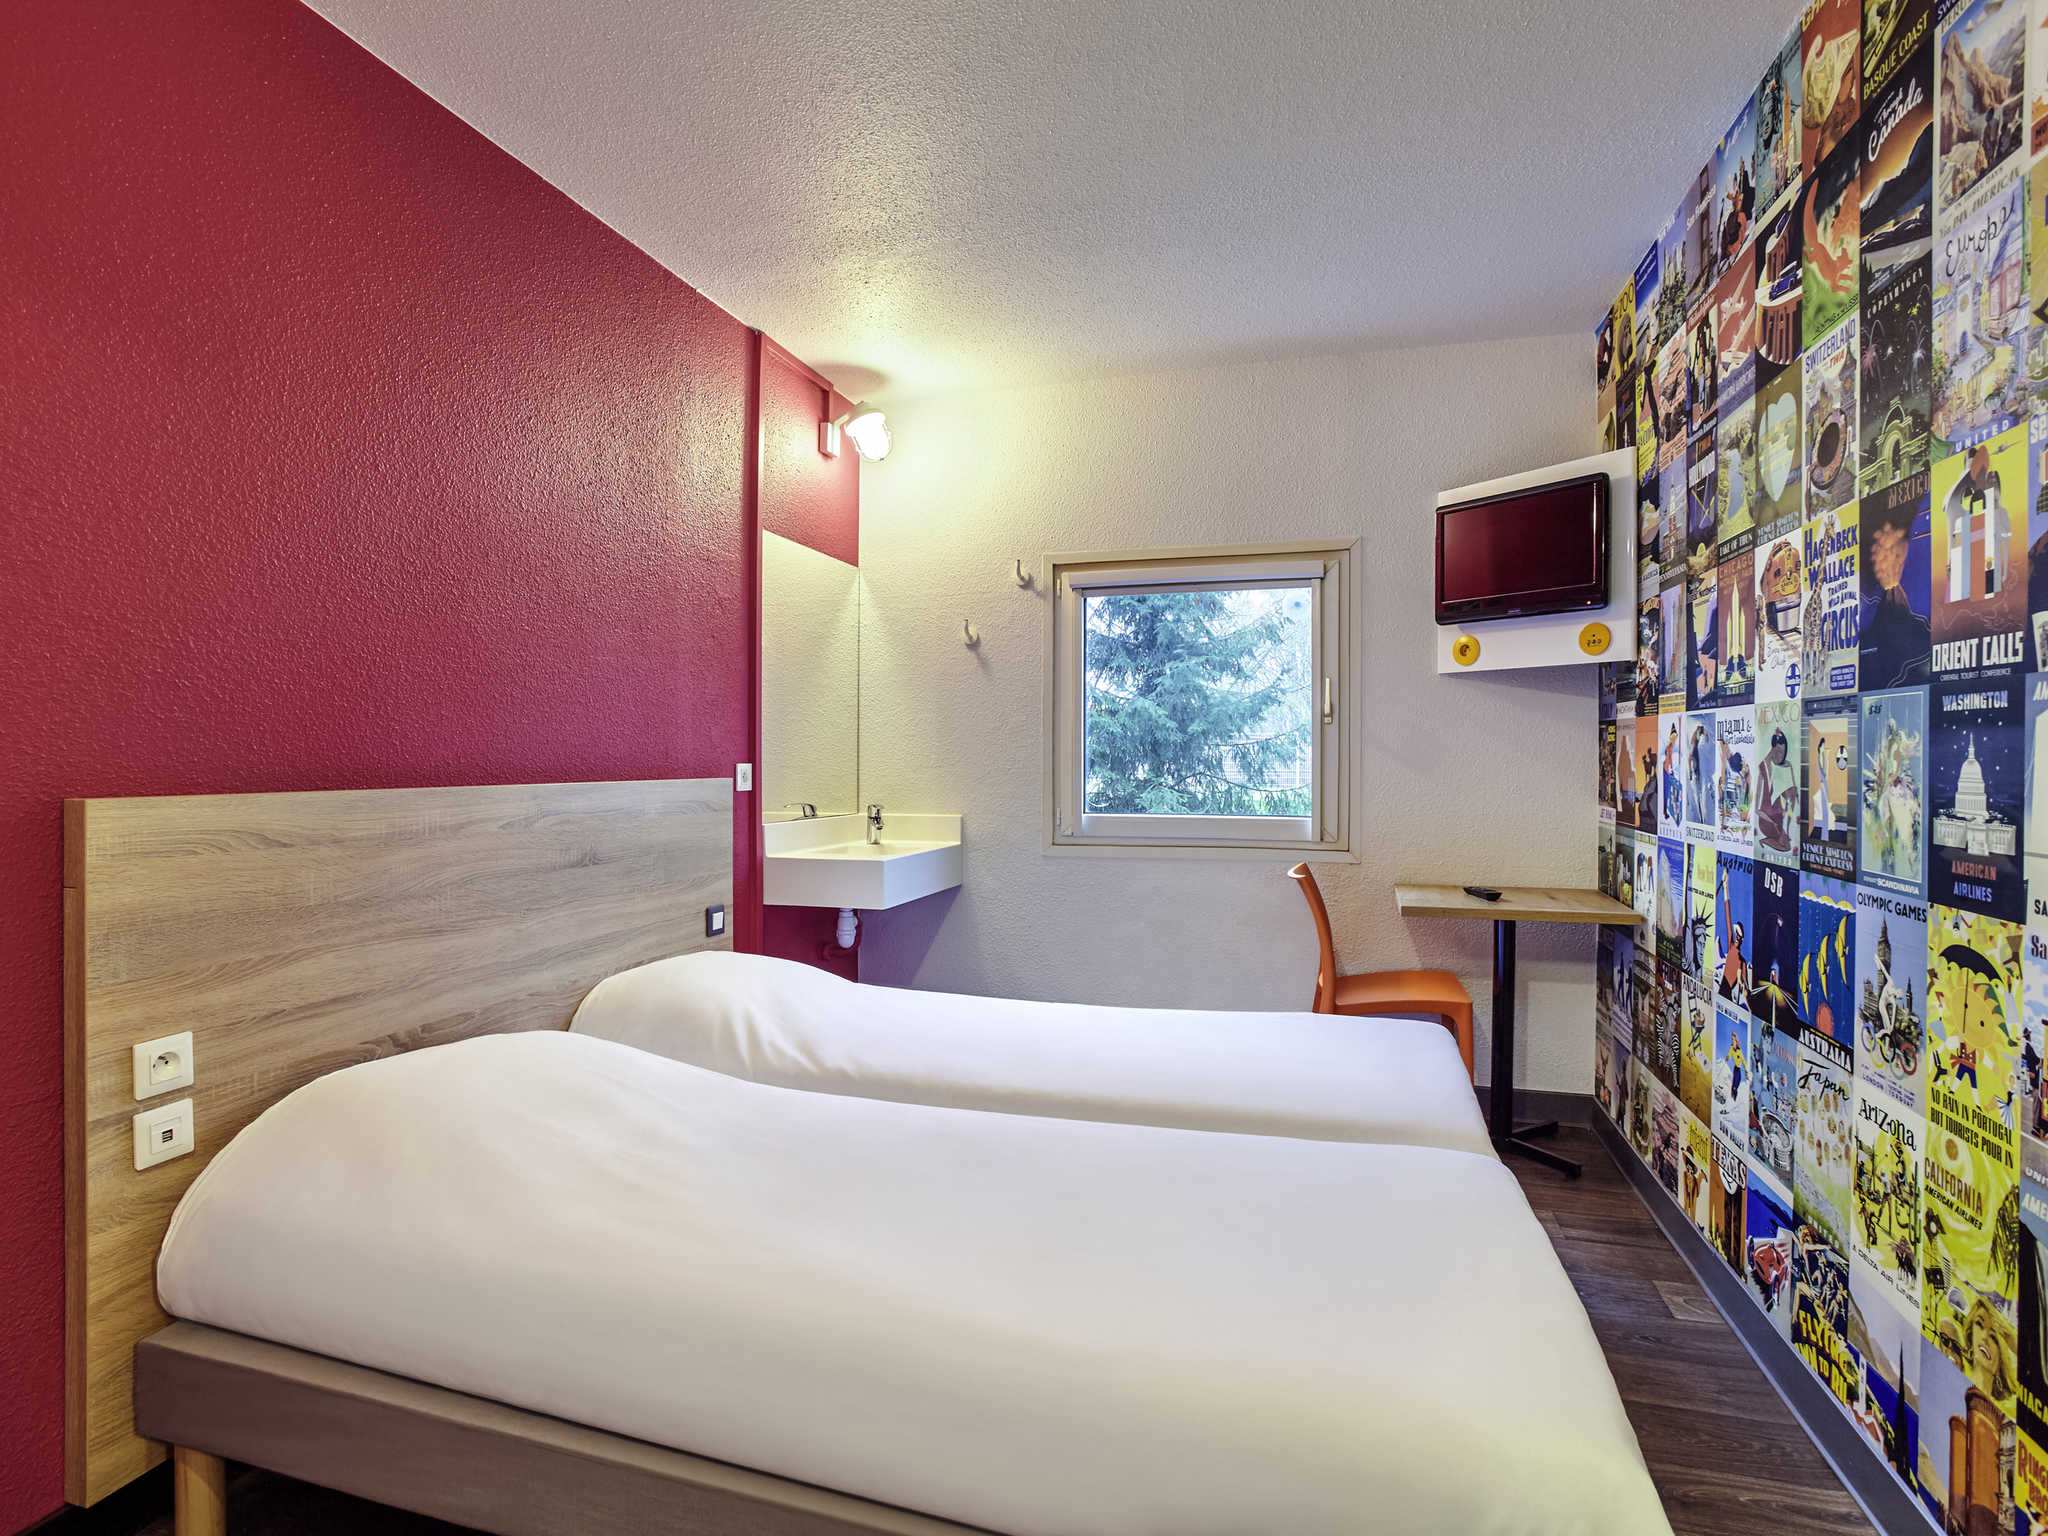 Отель — hotelF1 Antibes Sophia Antipolis (rénové)